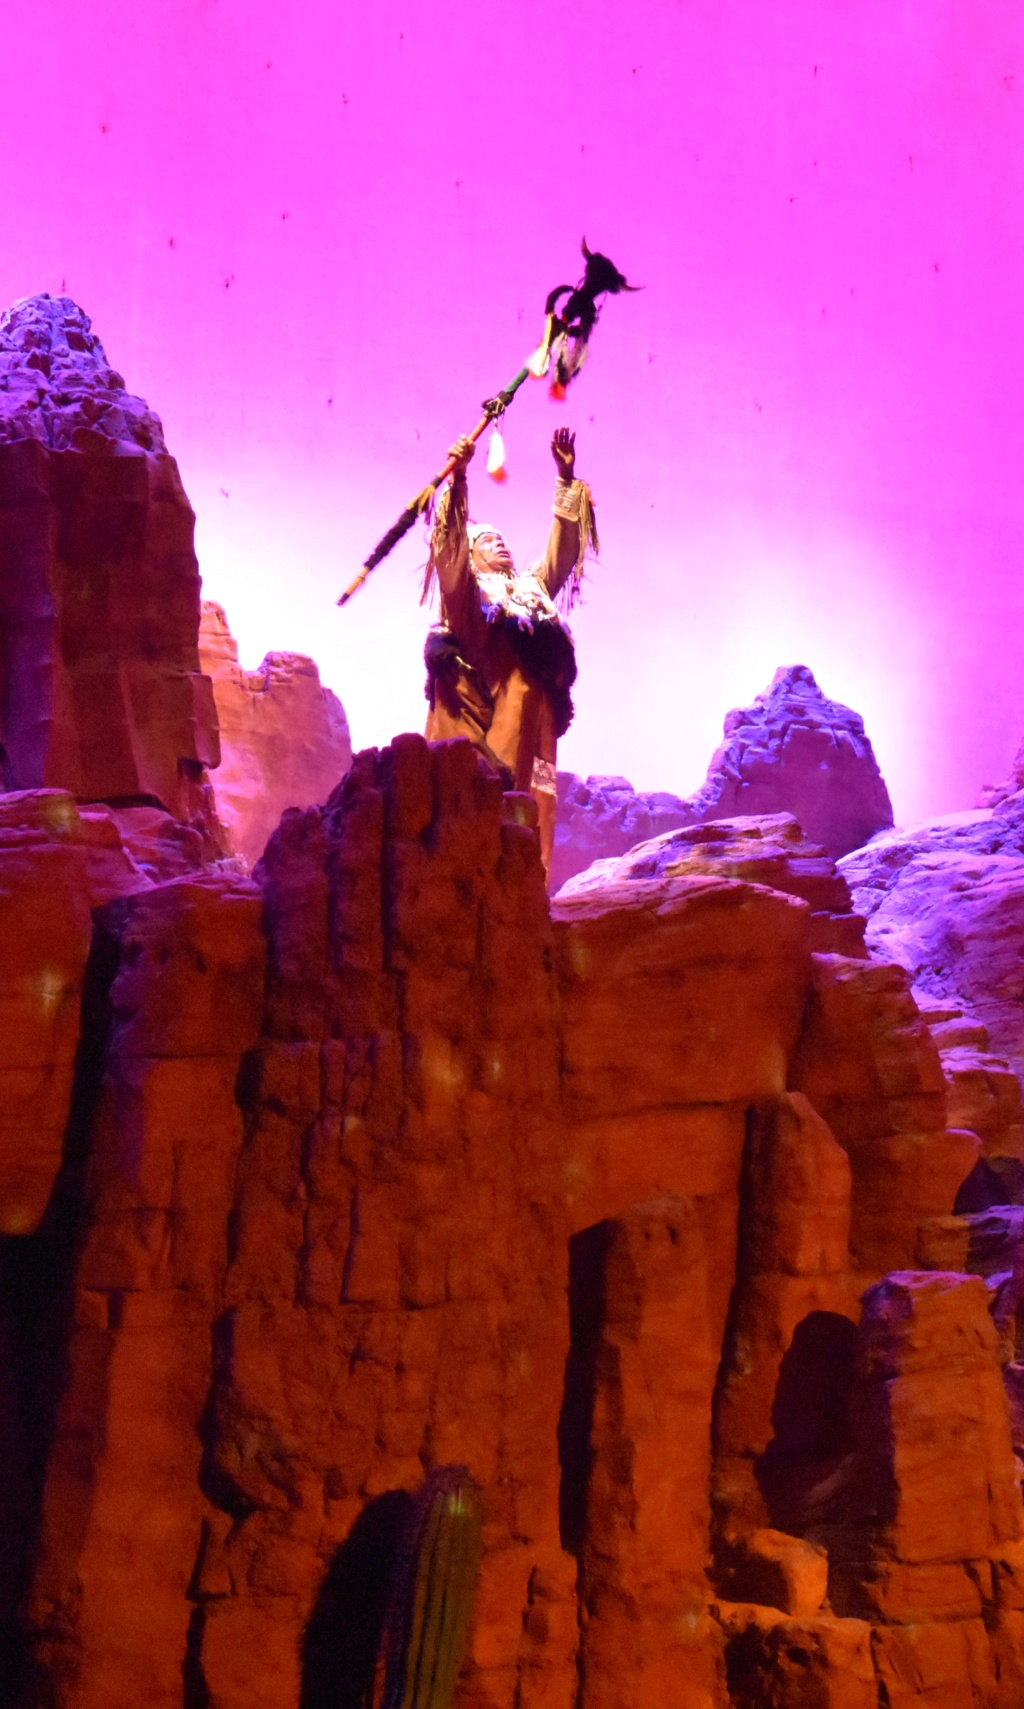 [TR] The magic must go on ♫ - Mars 2020 Buffal65